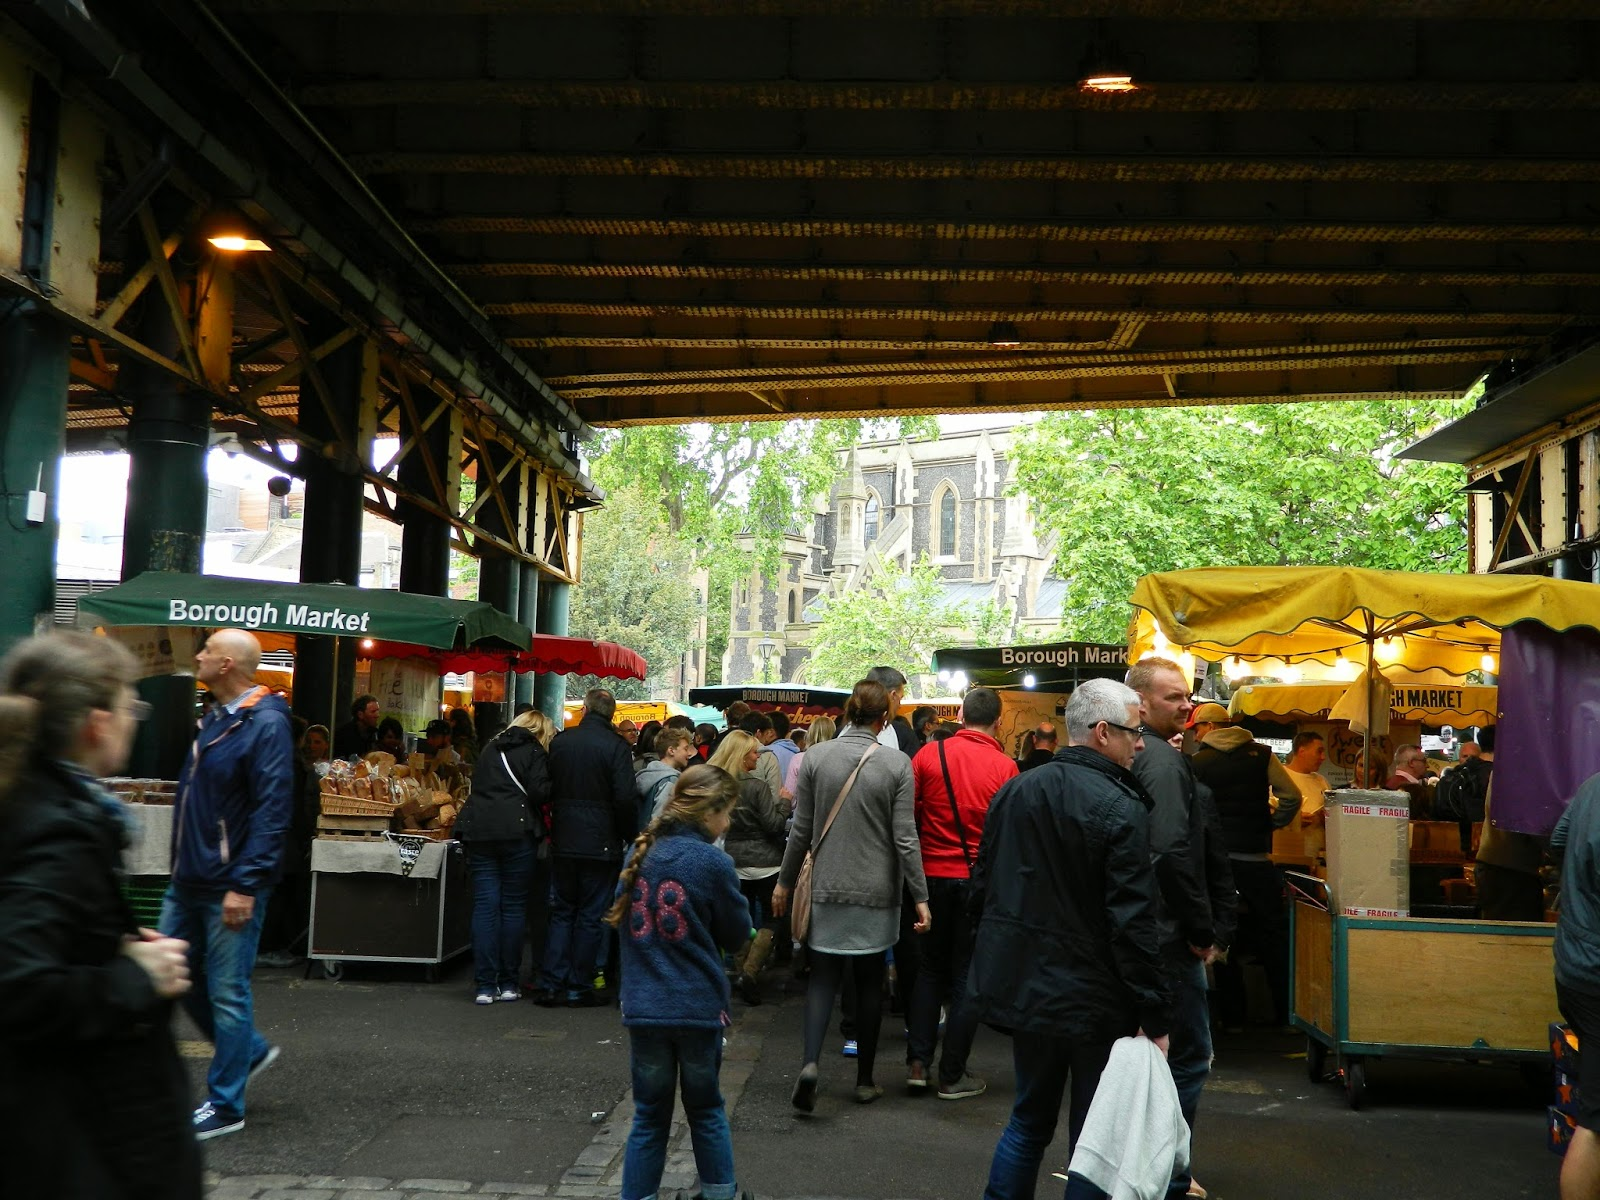 borough market london train bridge next to a cathedral